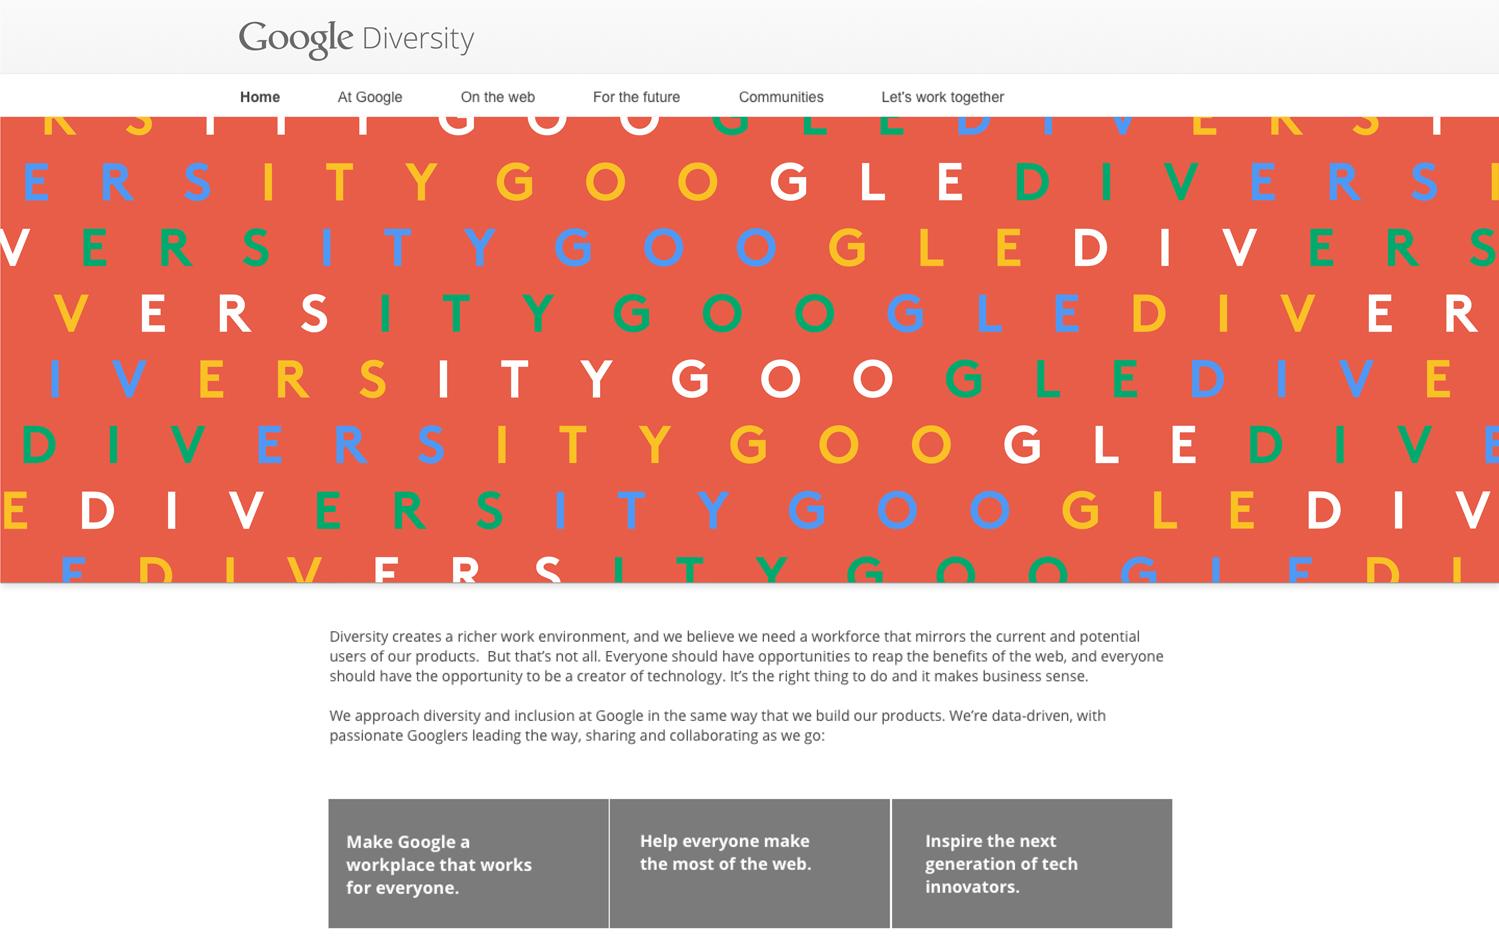 mchiao_google_diversity_07.jpg